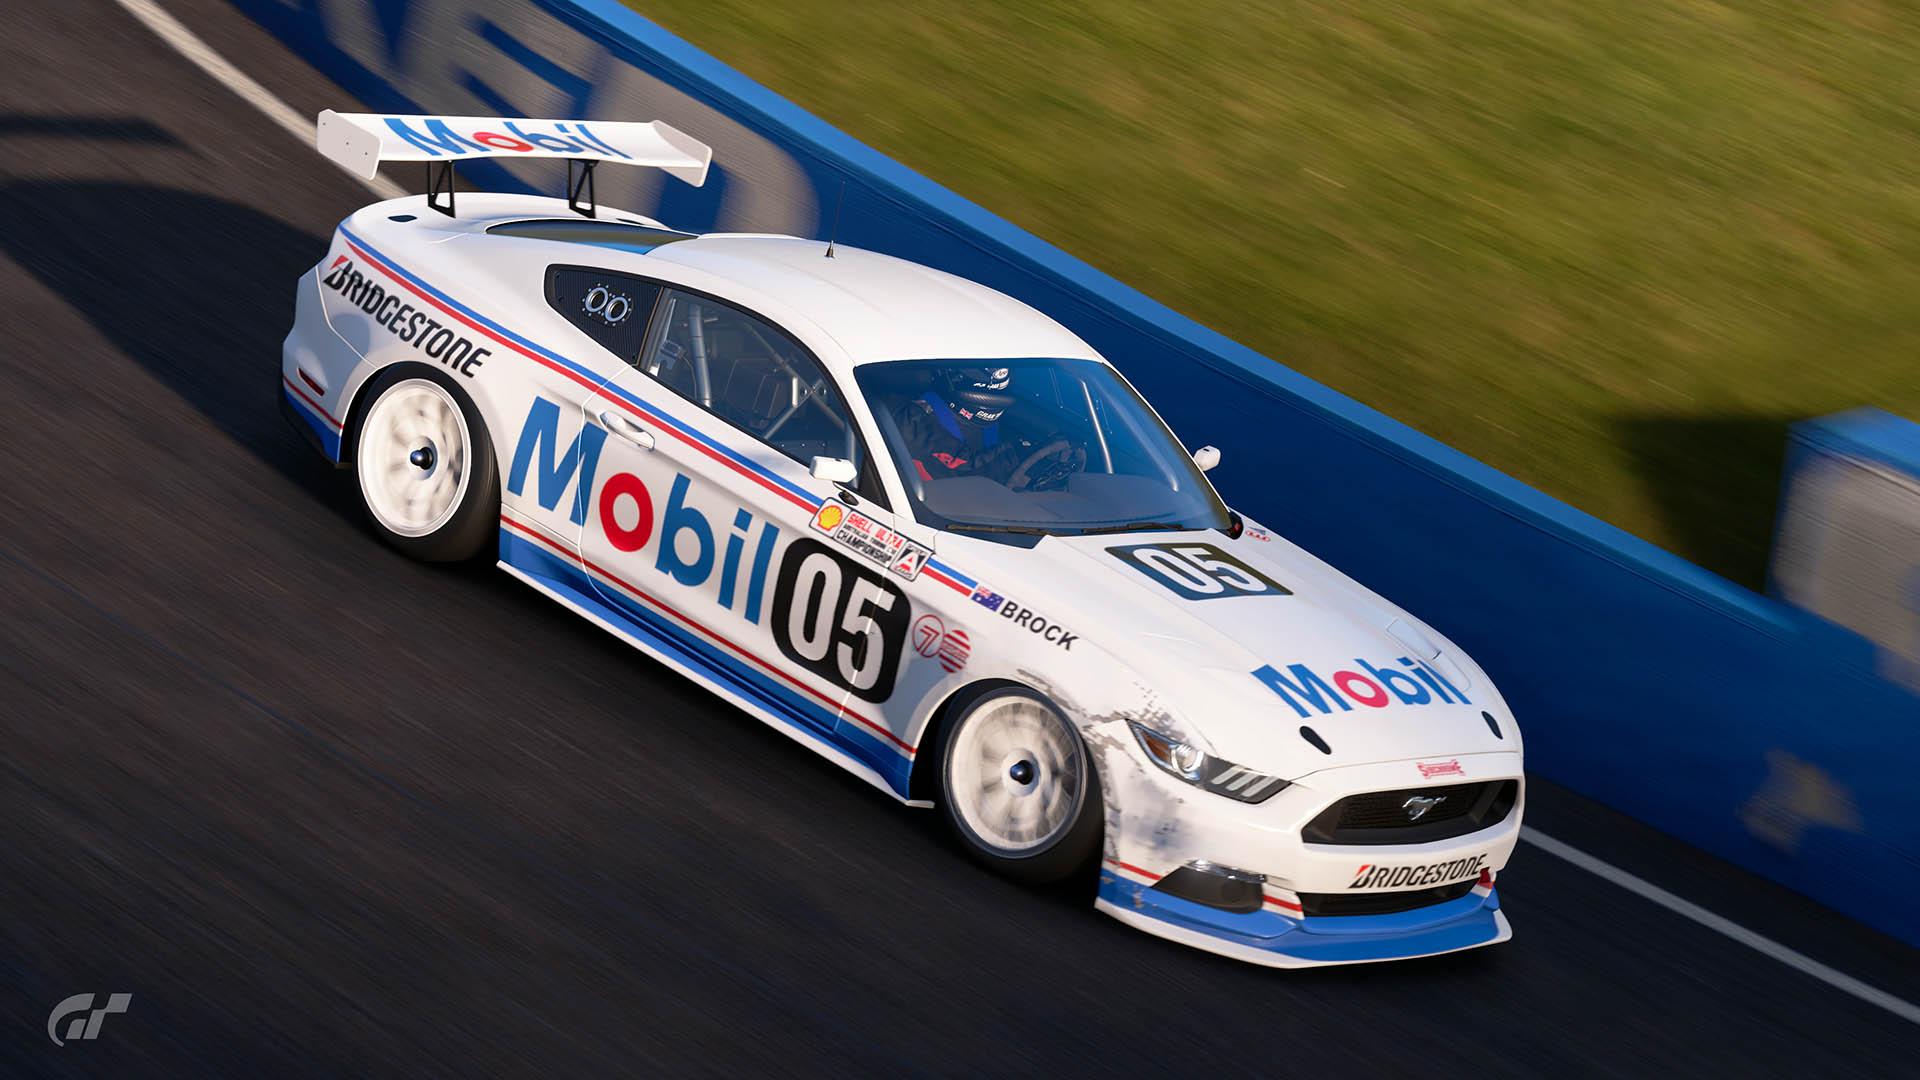 Mobil 1 Racing 1989 ATCC Ford Mustang Liveries